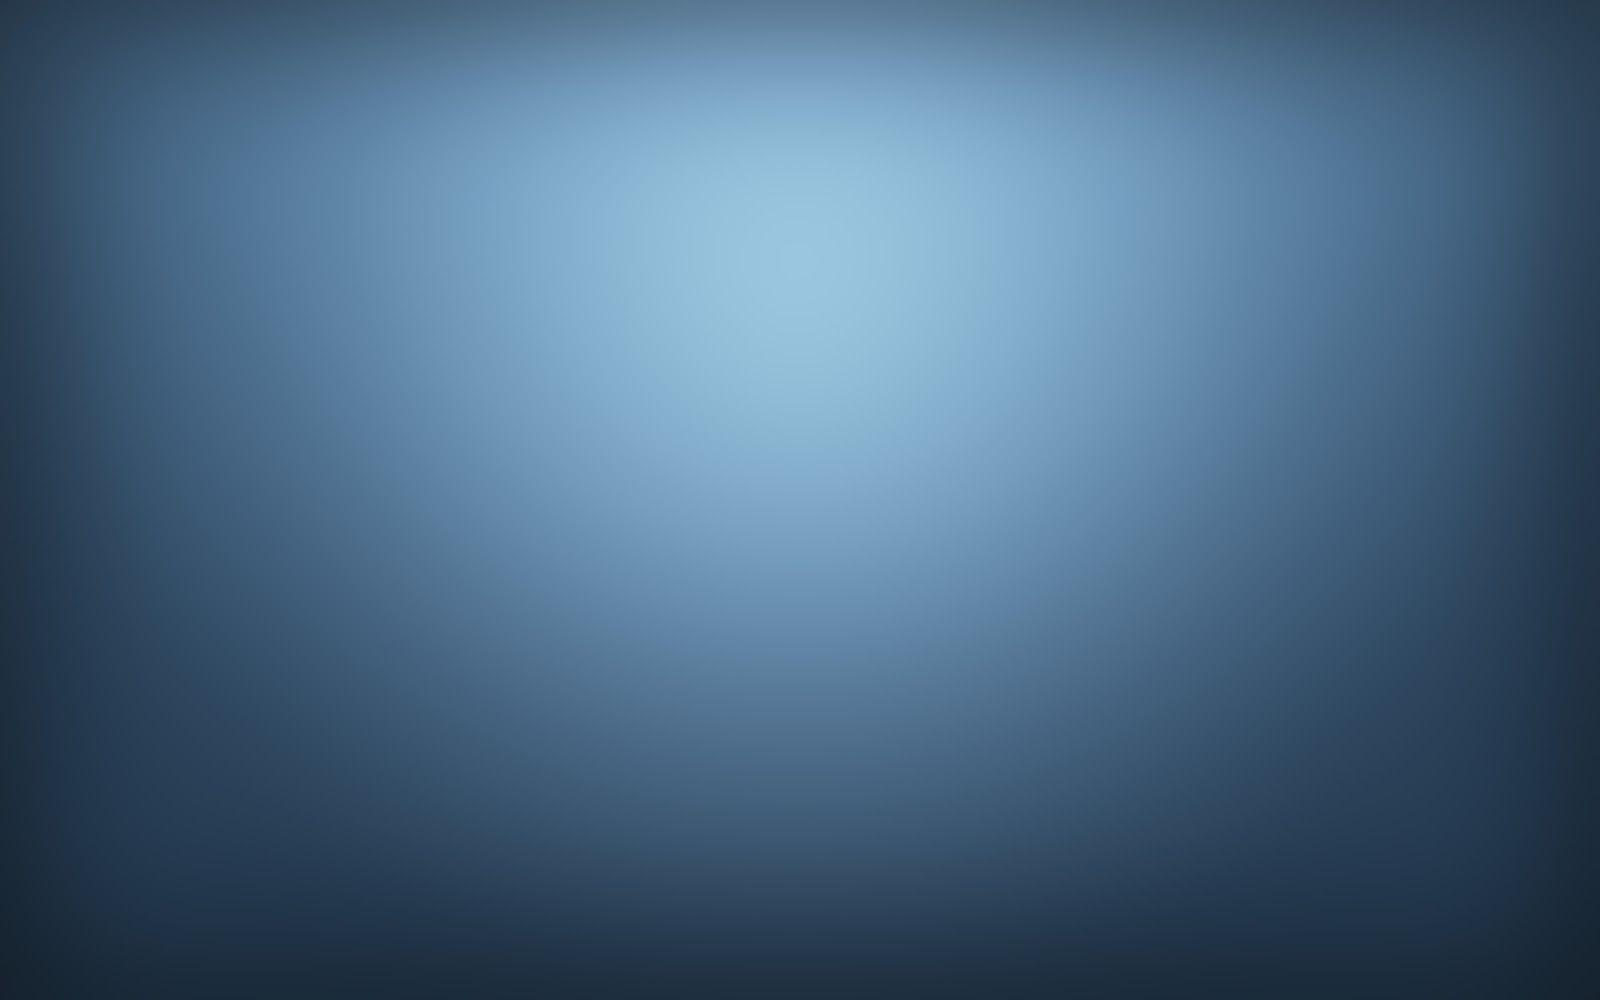 Plain Desktop Wallpapers - Top Free